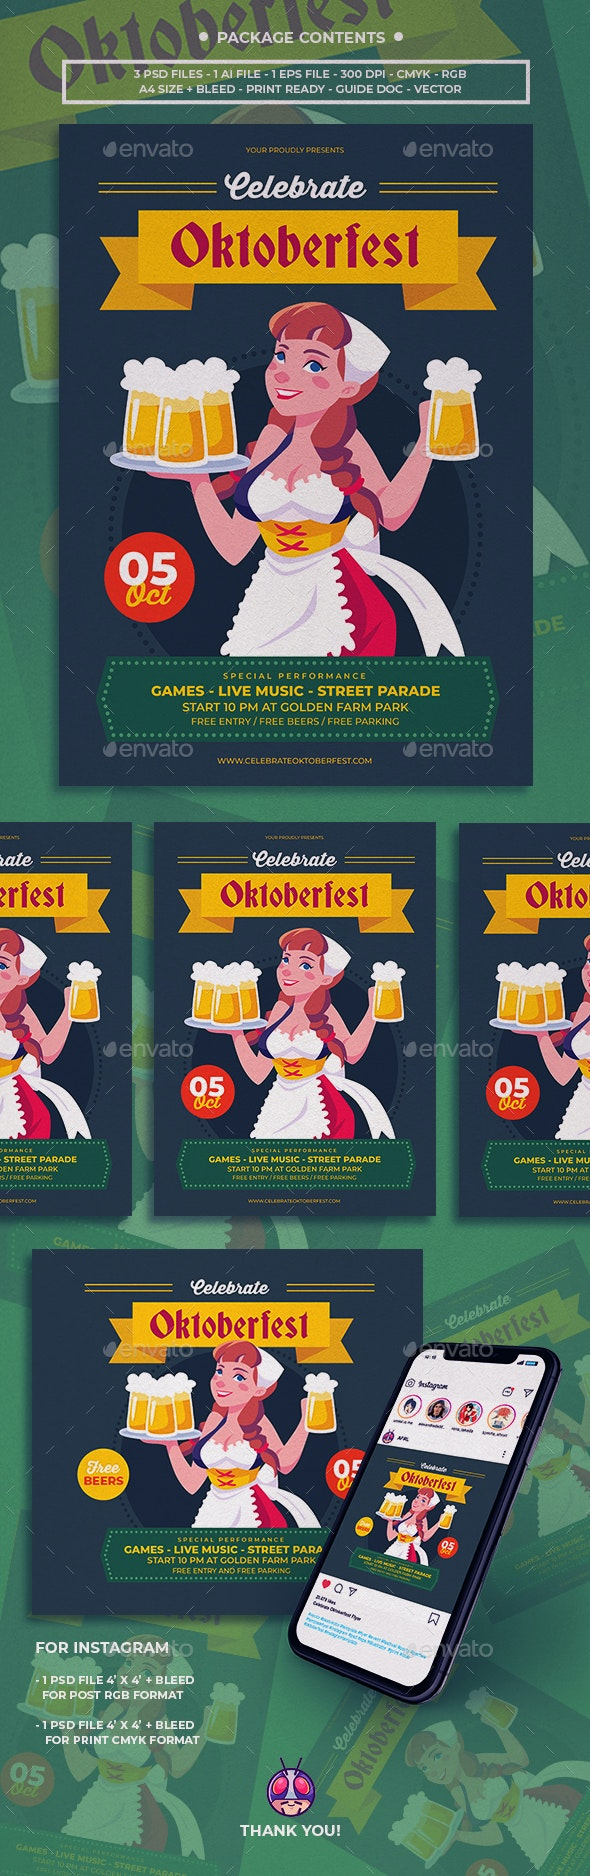 Celebrate Oktoberfest Flyer - Anniversary Greeting Cards